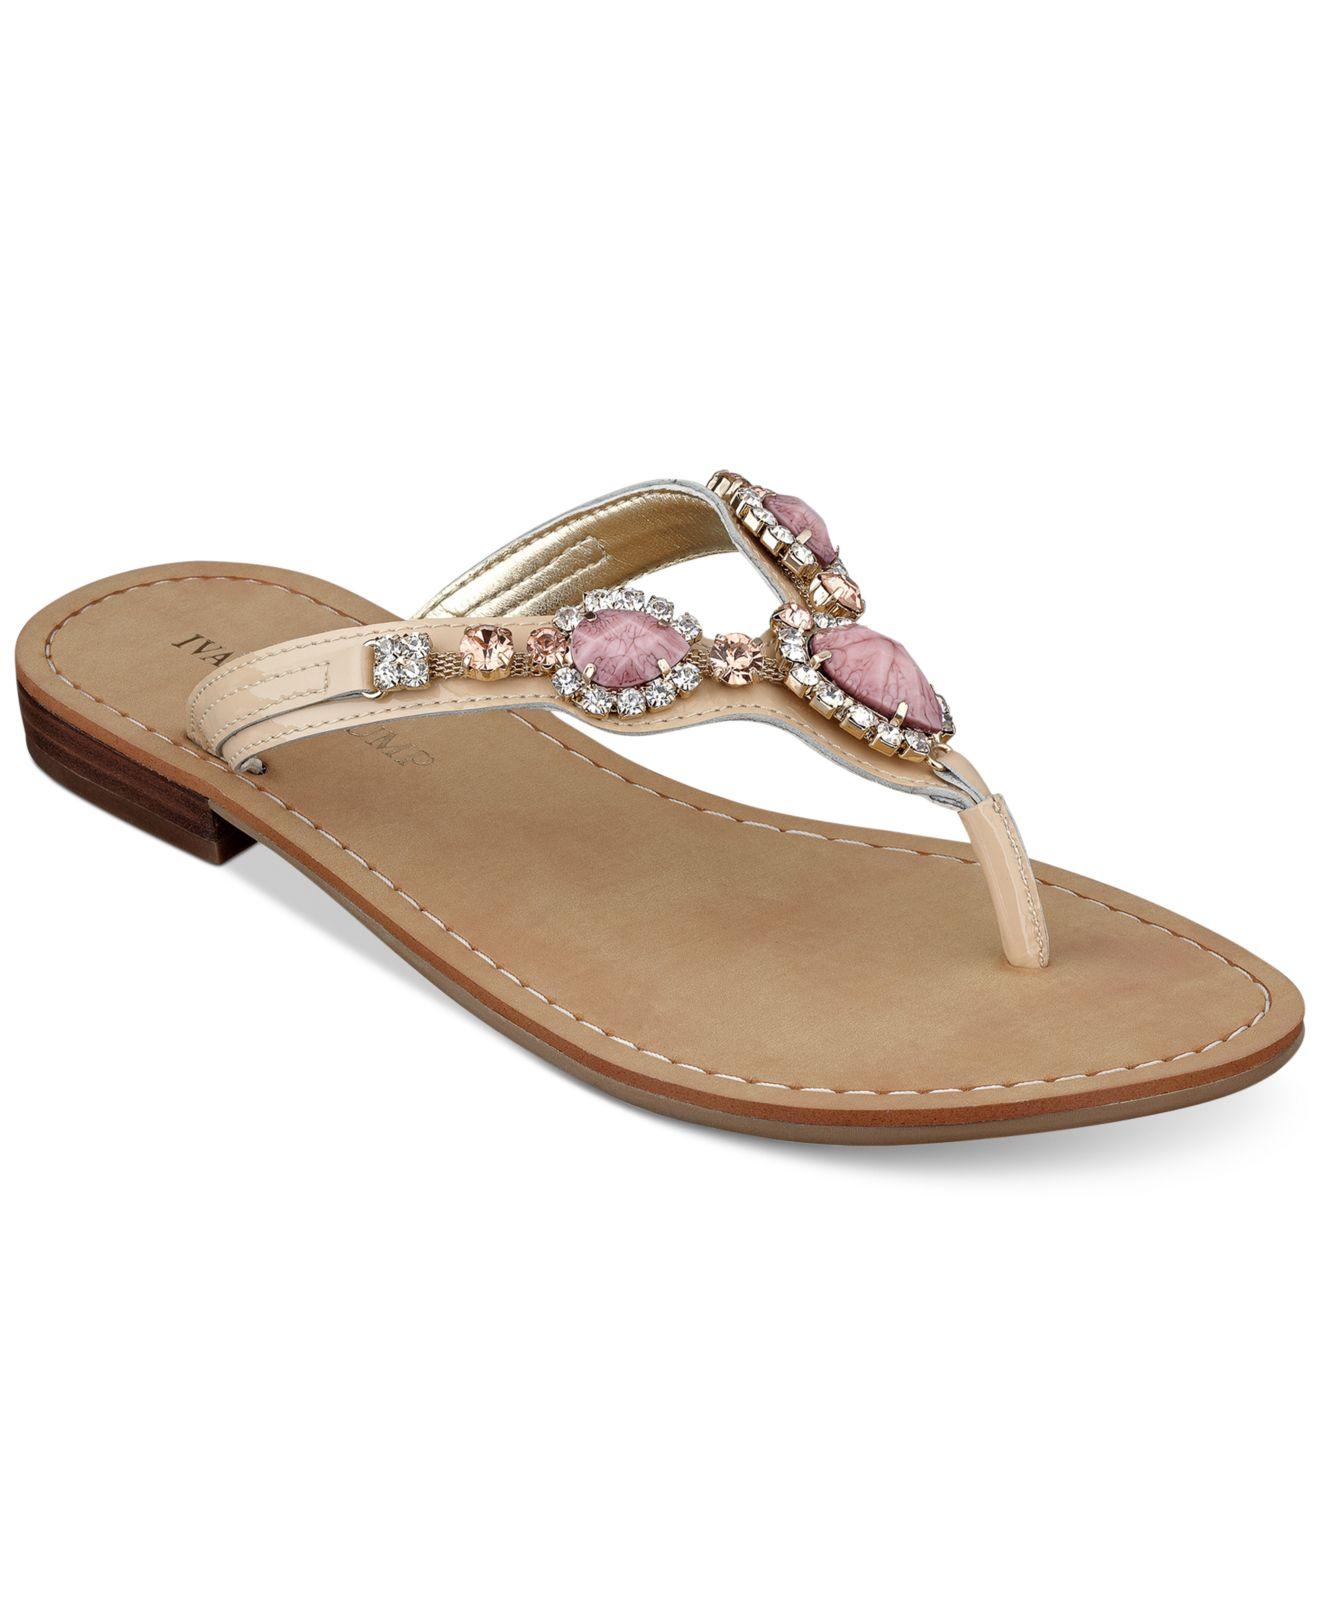 Ivanka Trump Palla Jeweled Thong Sandals In Pink Lyst